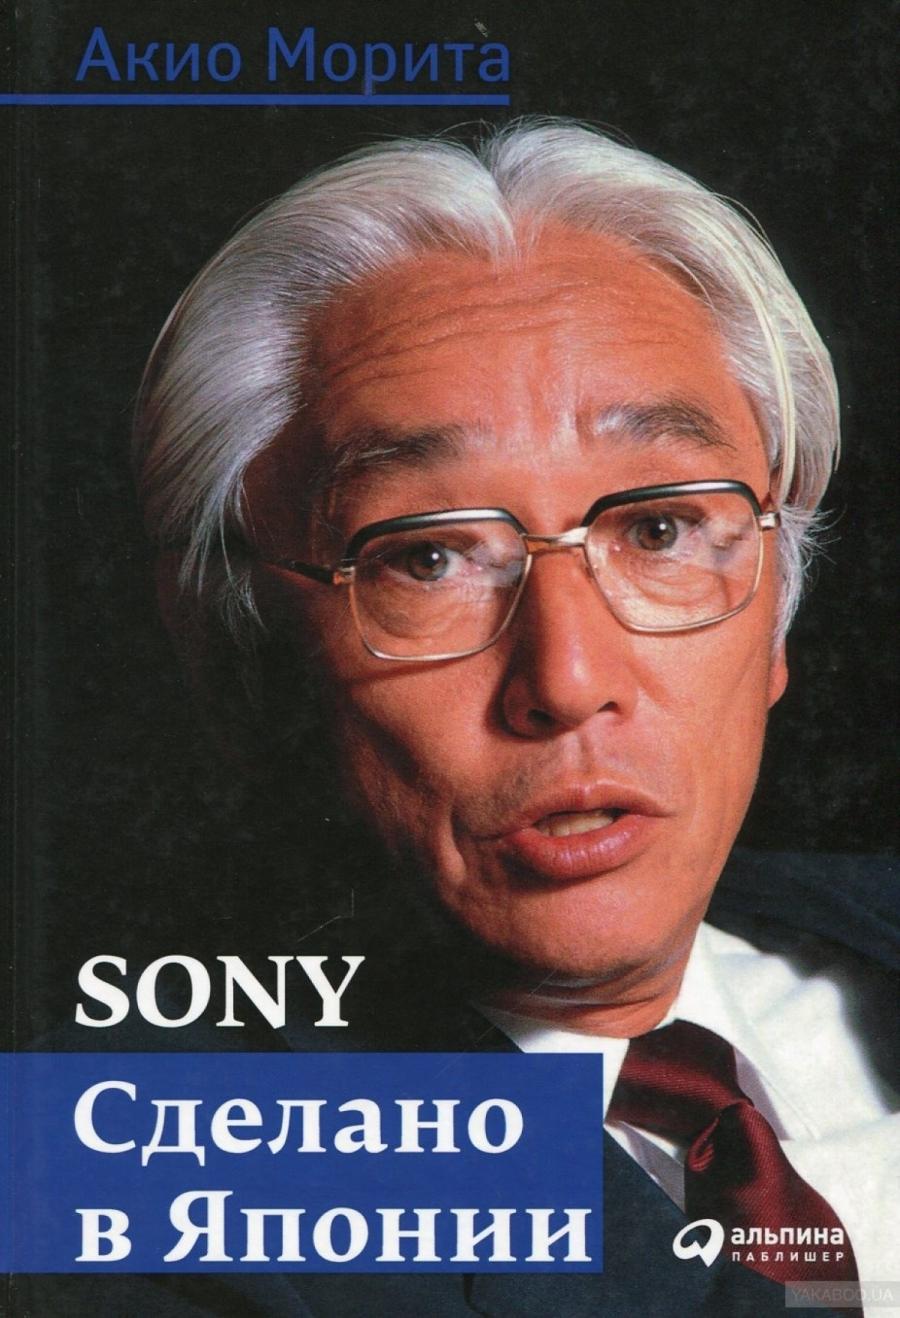 Обложка книги:  акио морита - sony сделано в японии